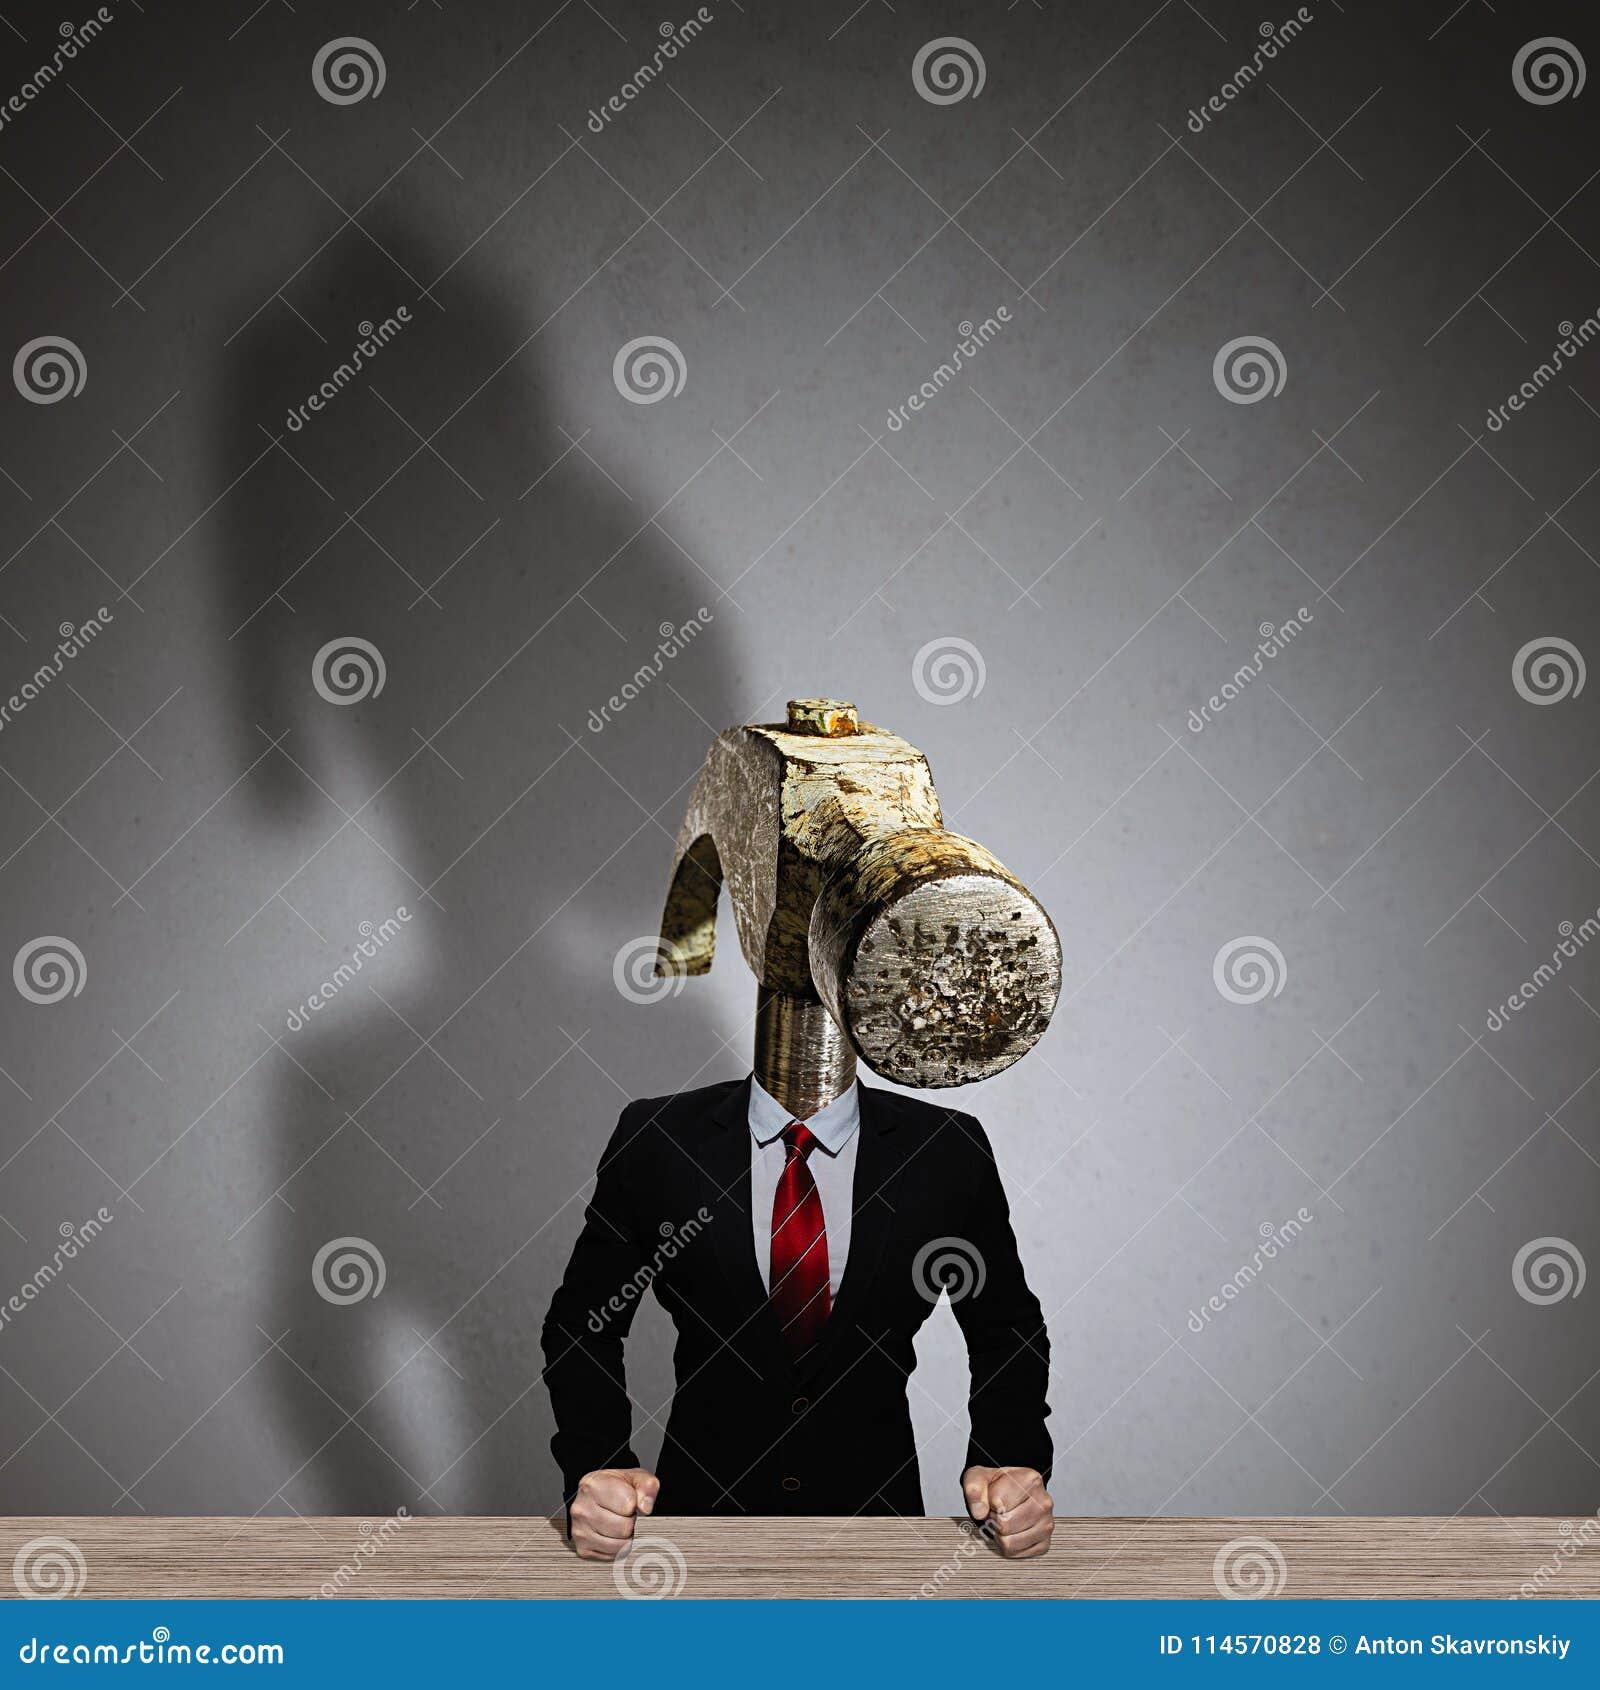 Метафора сердитого босса